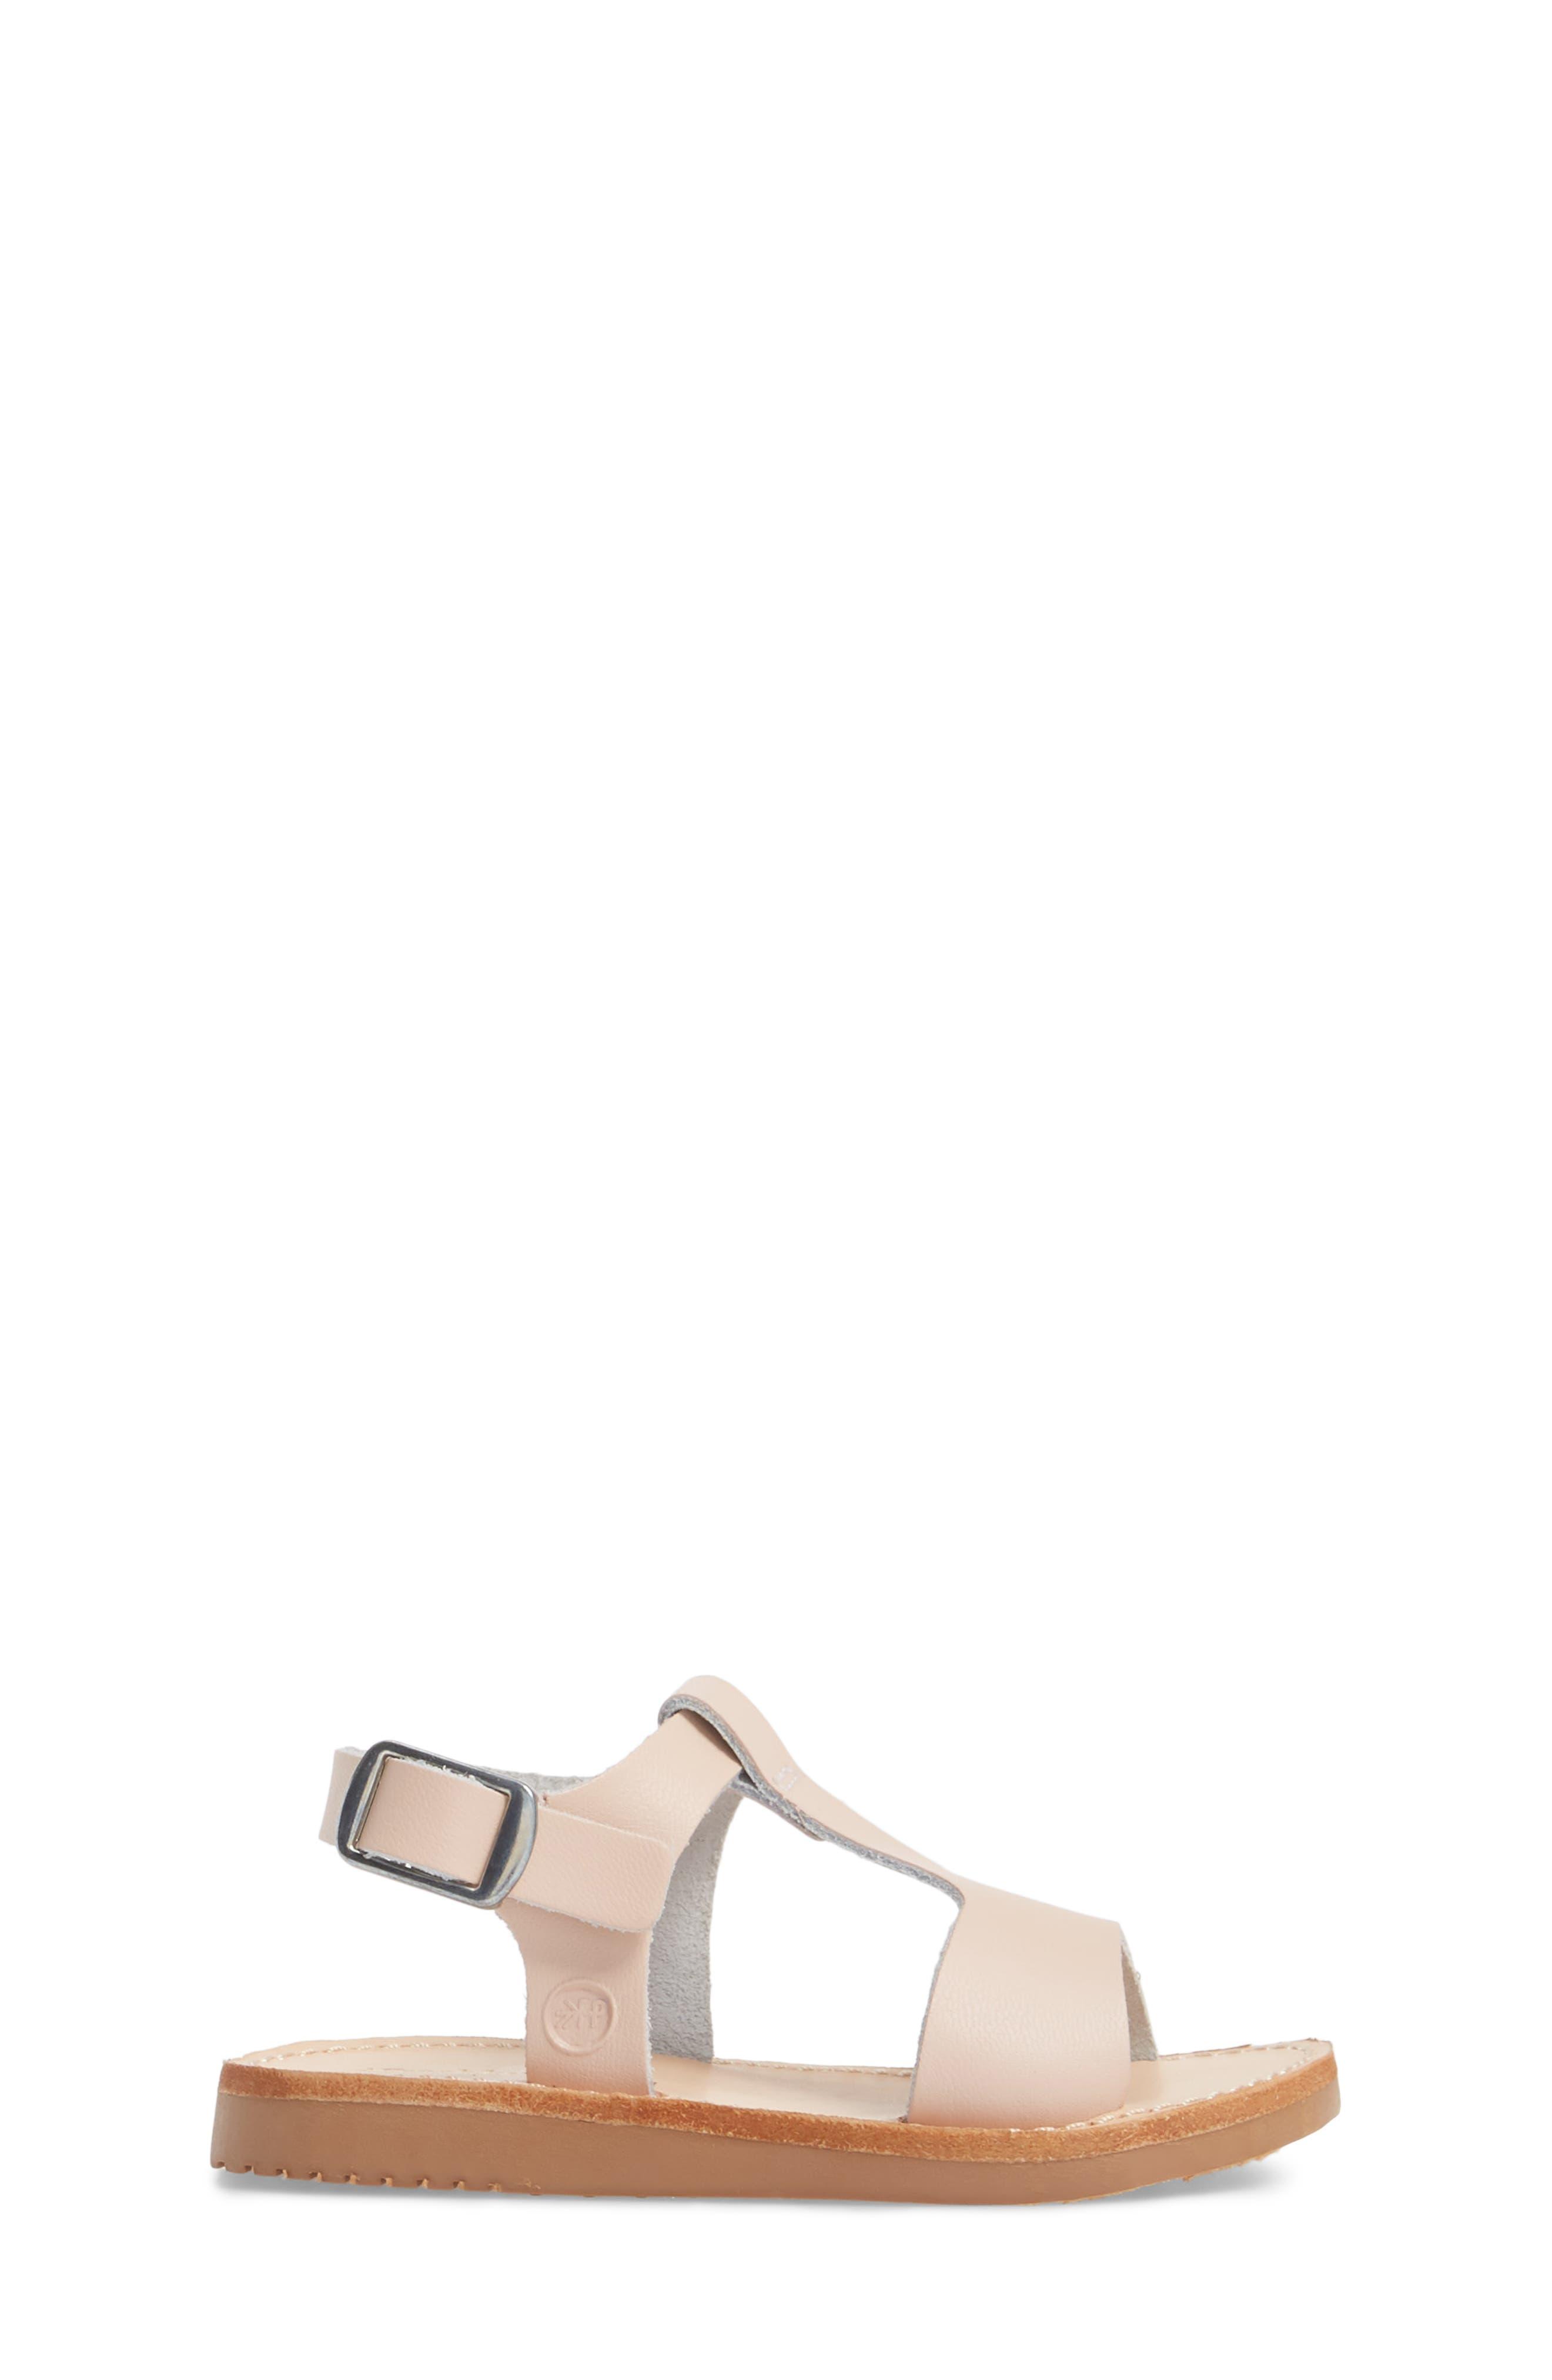 Malibu Water Resistant Sandal,                             Alternate thumbnail 3, color,                             Blush